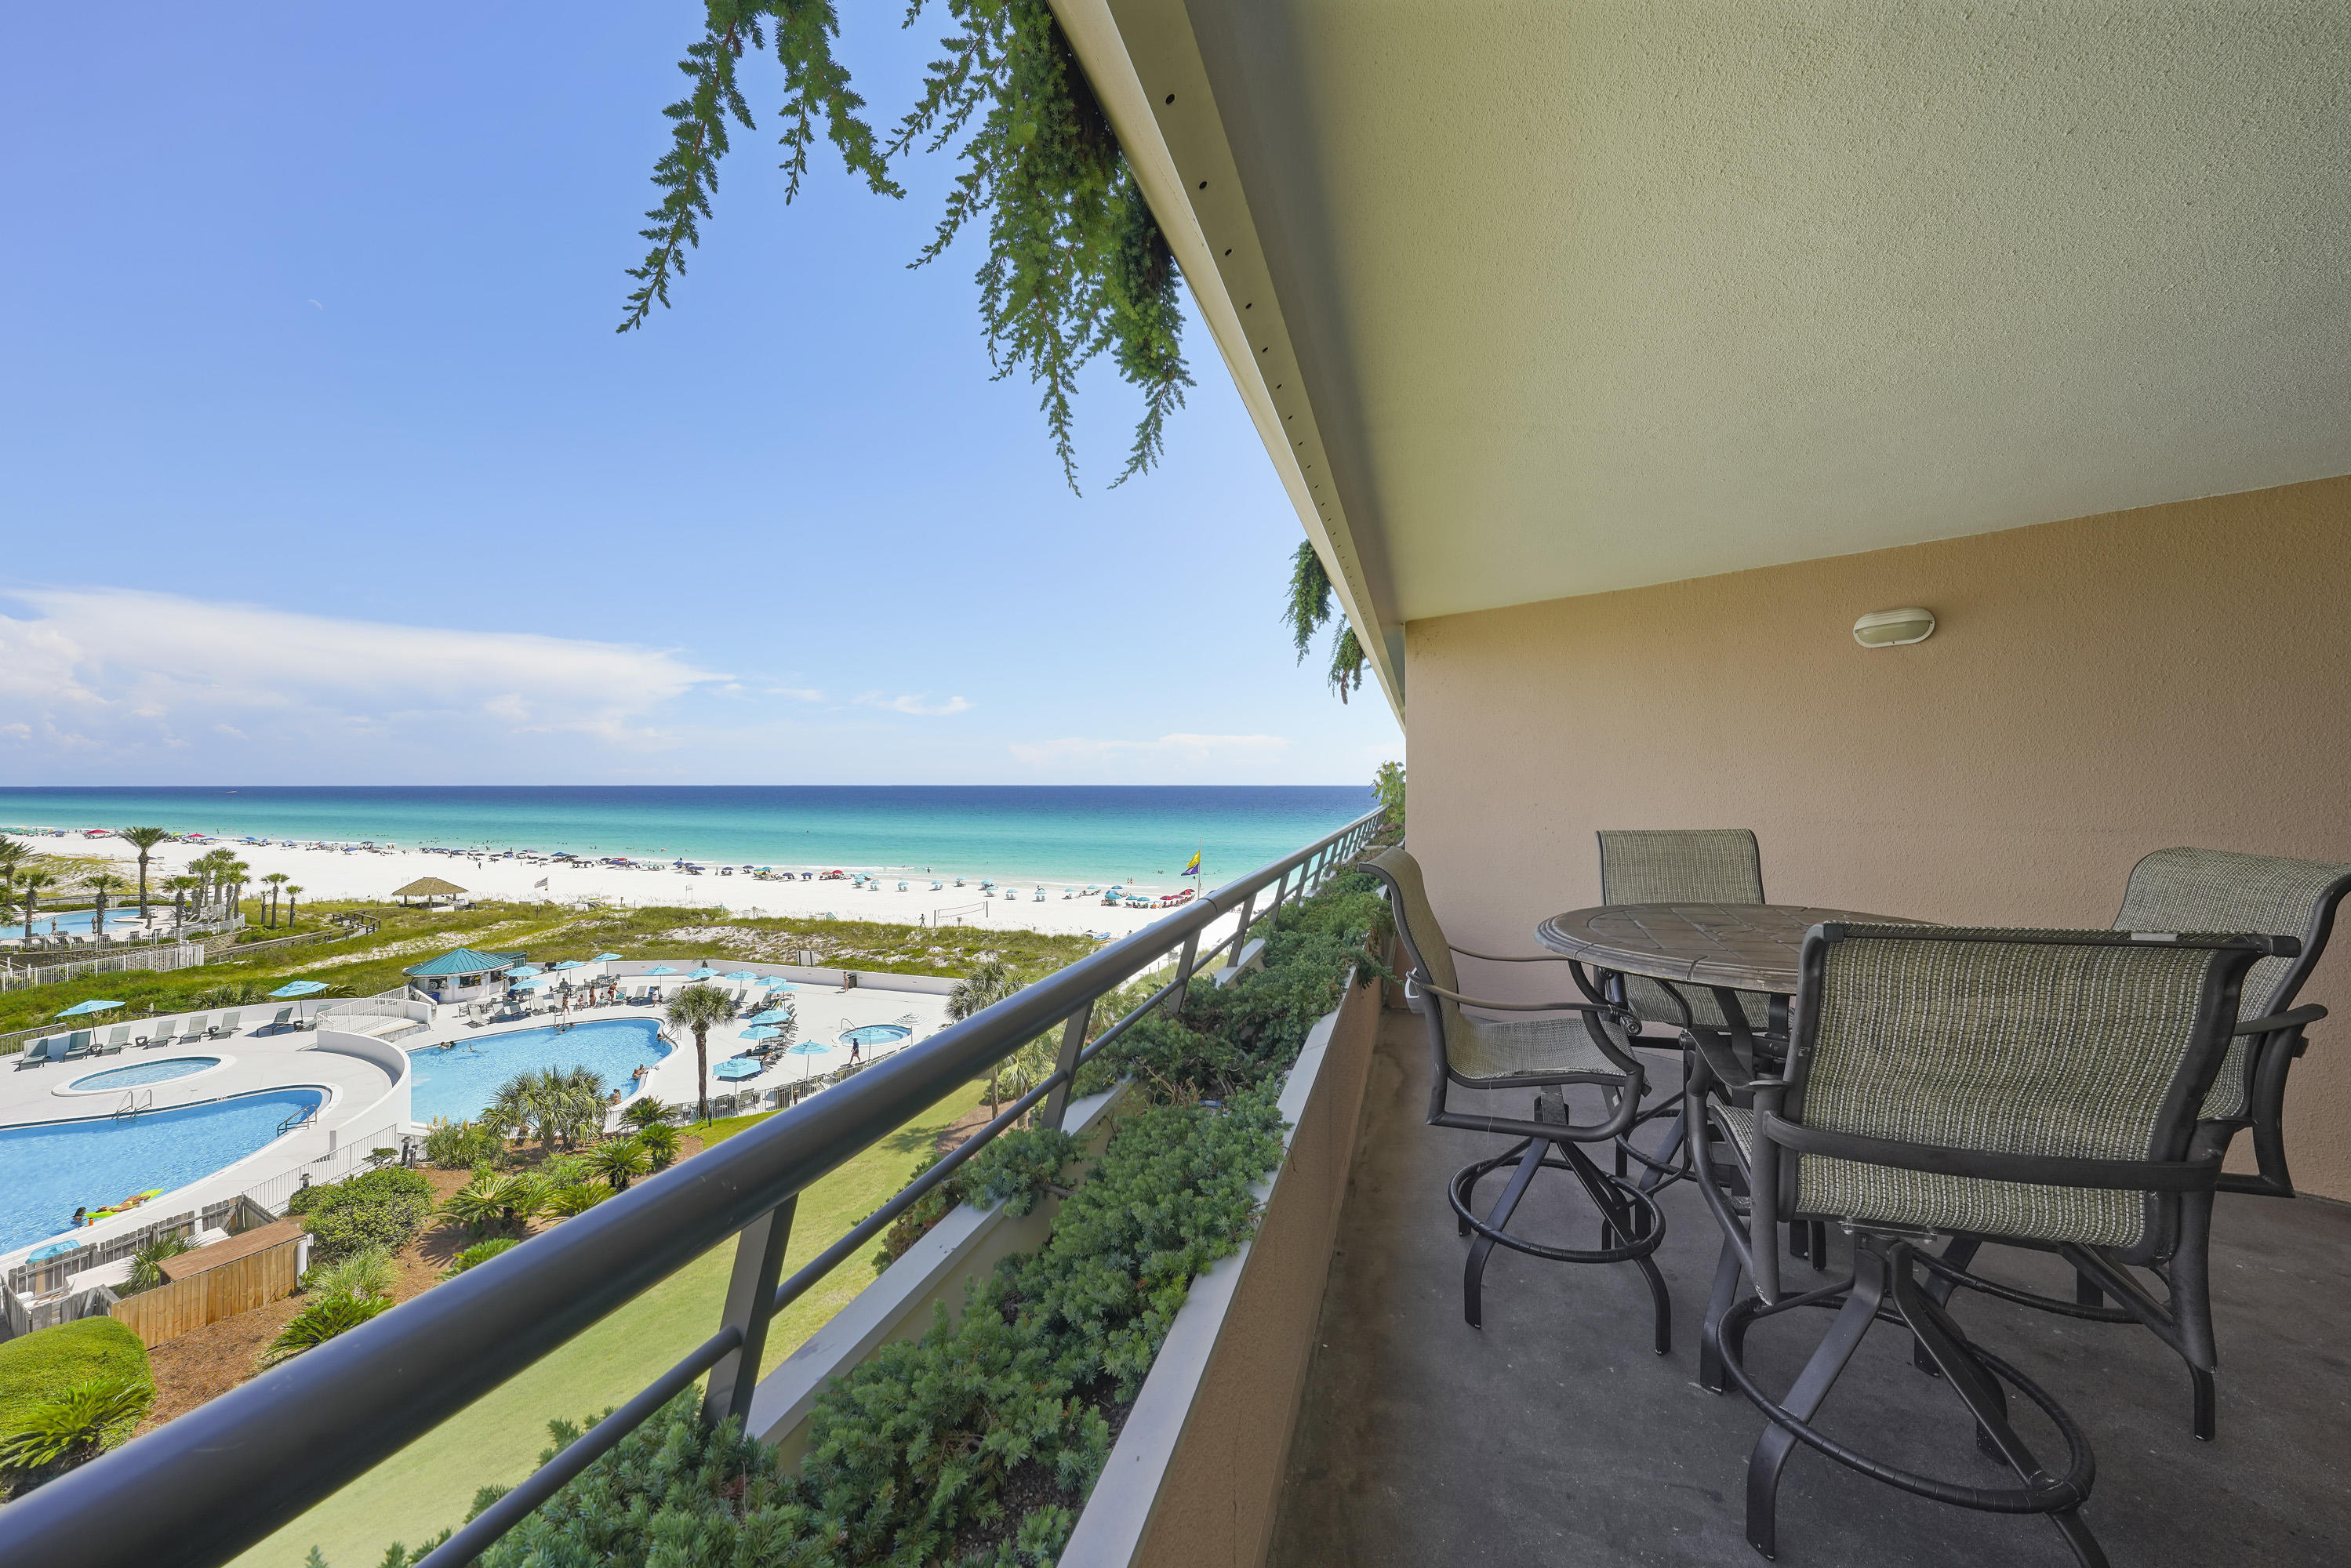 291 Scenic Gulf Drive 611, Miramar Beach, FL 32550